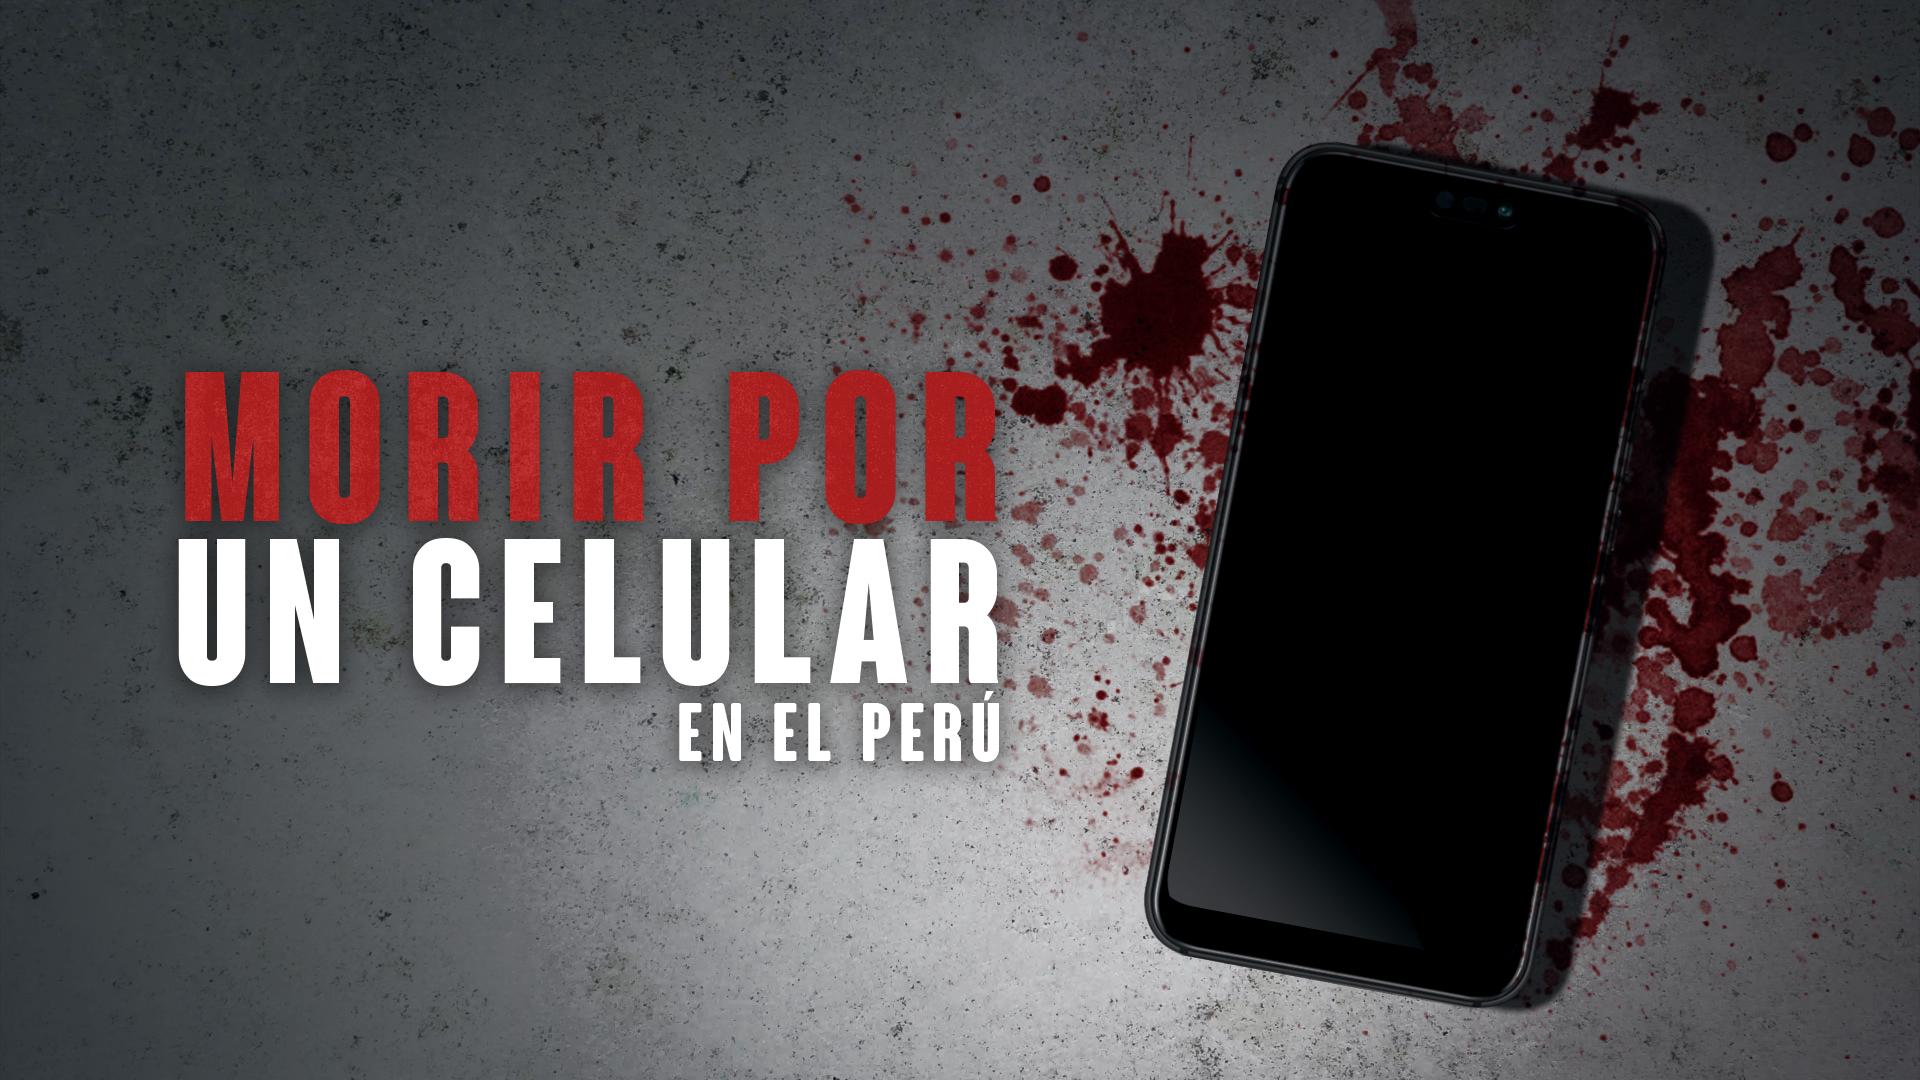 #EstoyAlerta: Morir por un celular